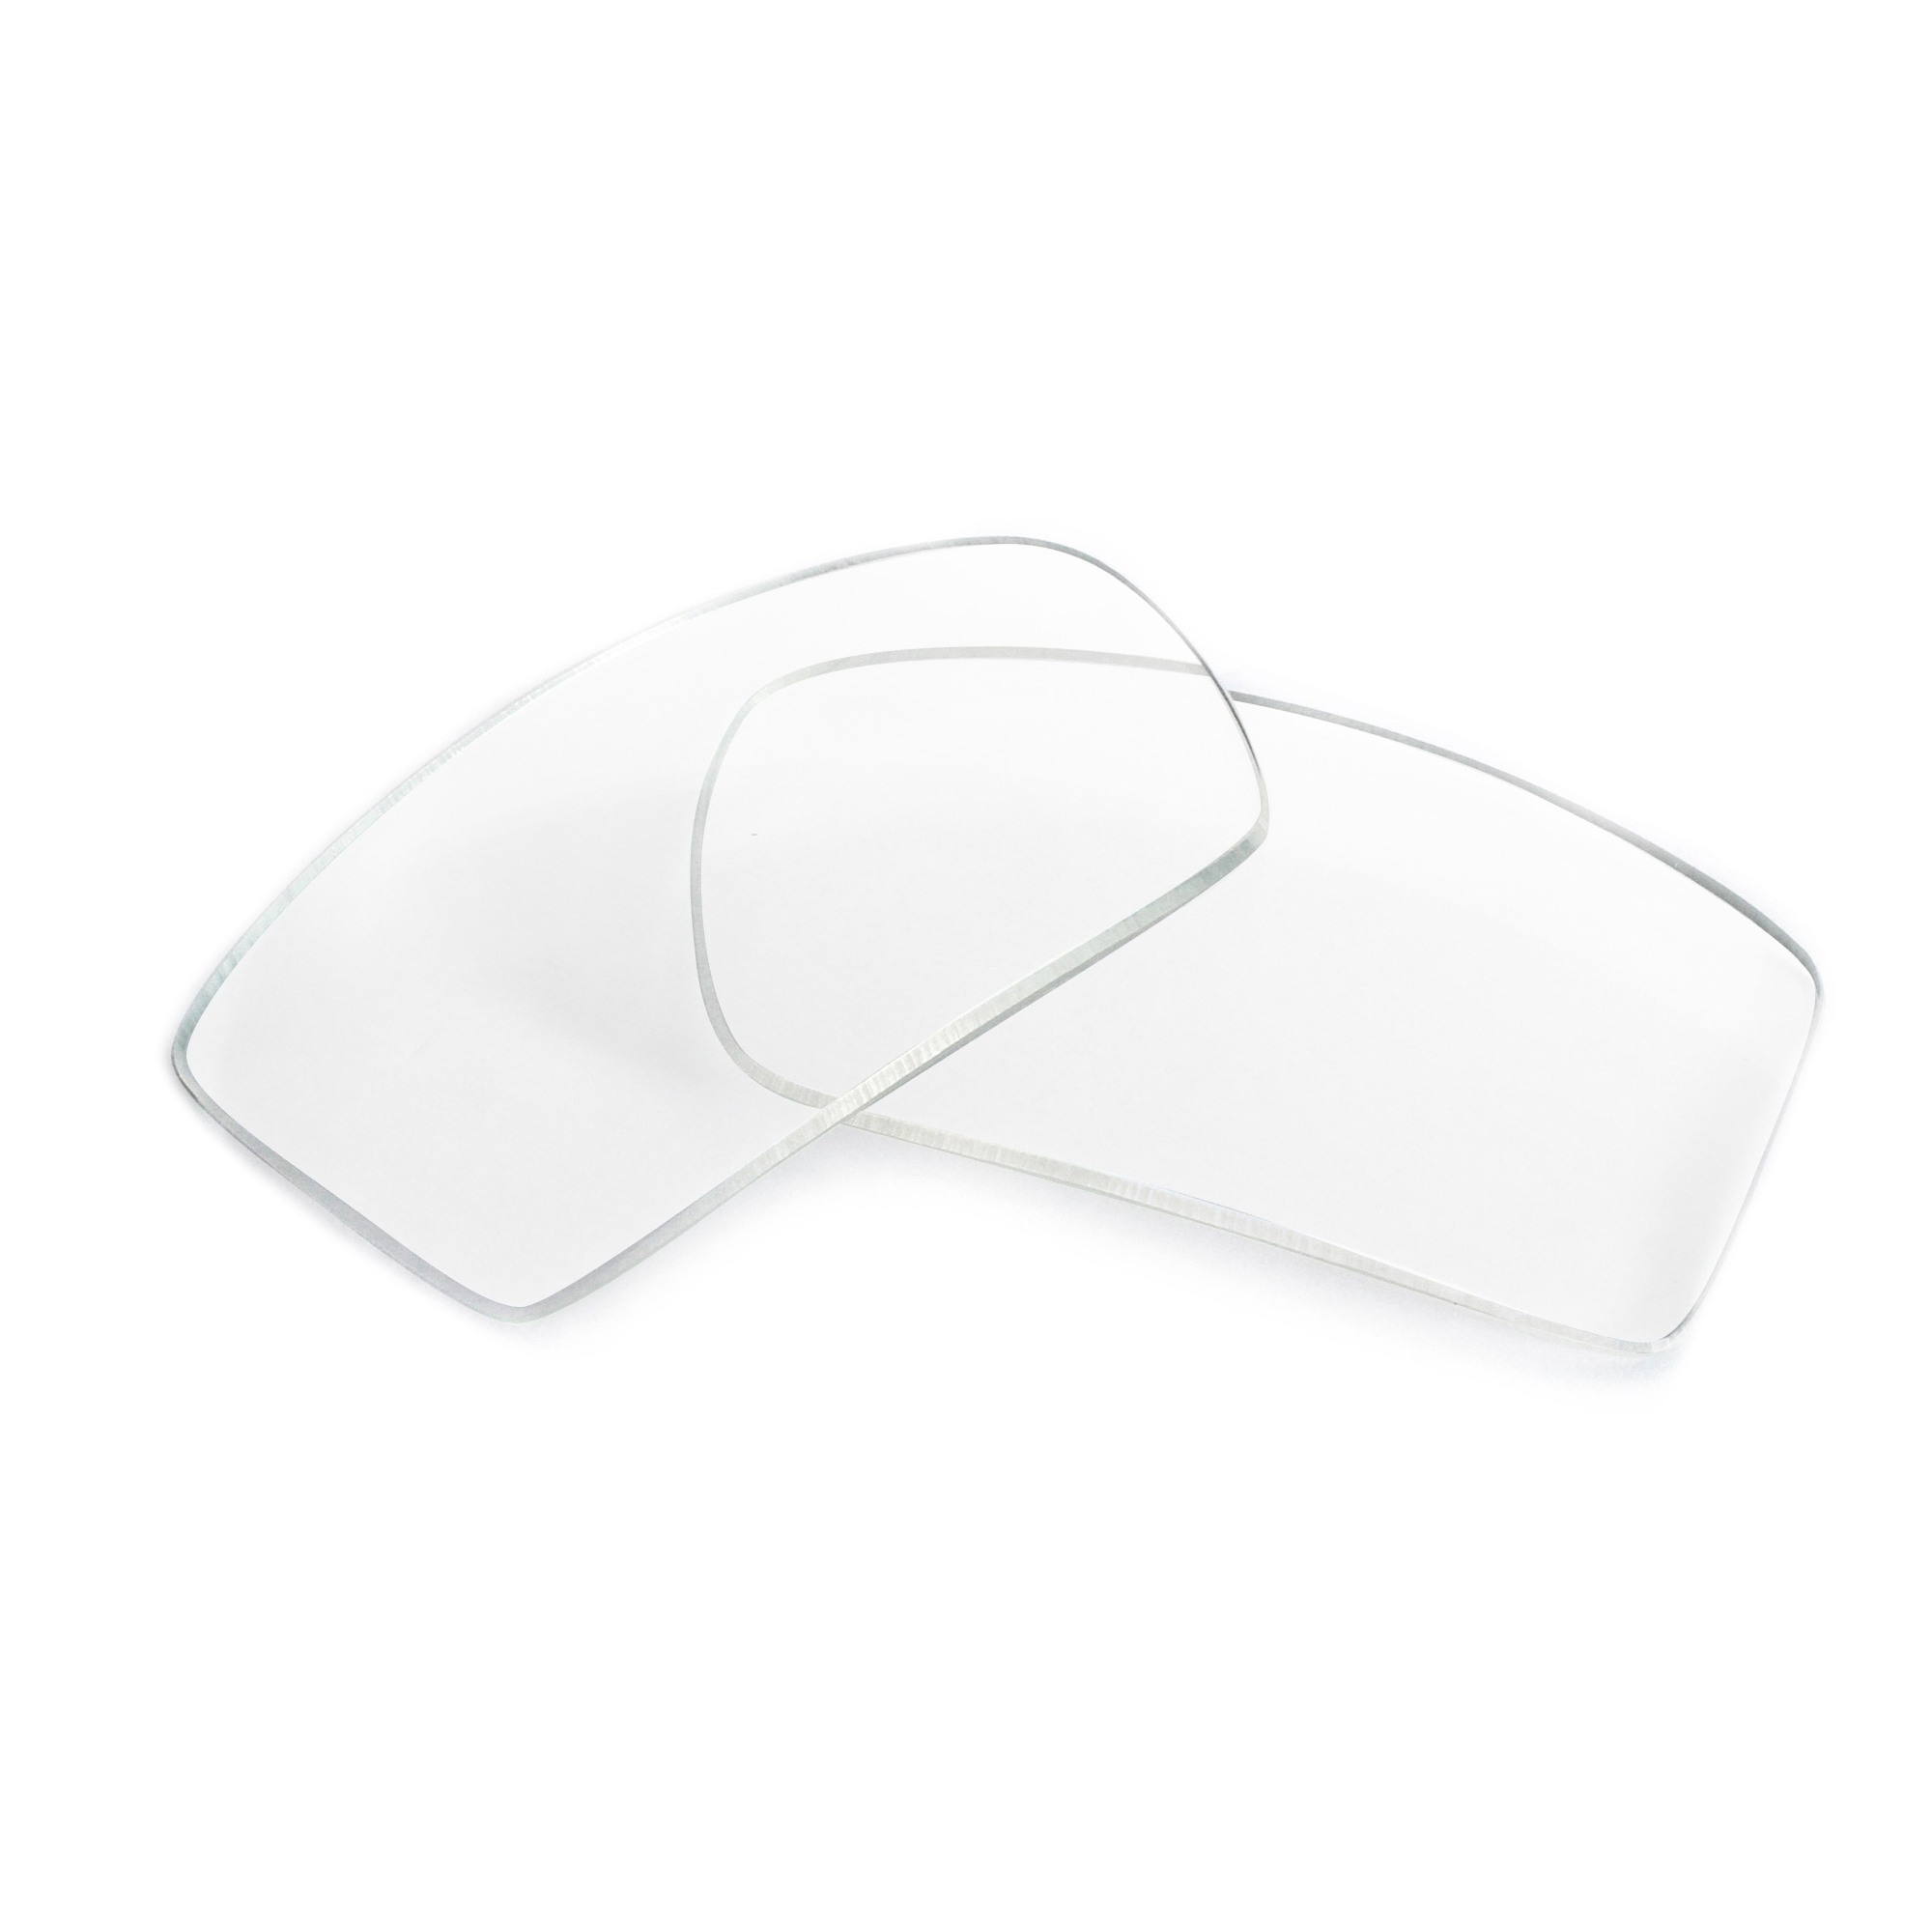 Fuse Lenses Non-Polarized Replacement Lenses for Arnette Fastball AN4202